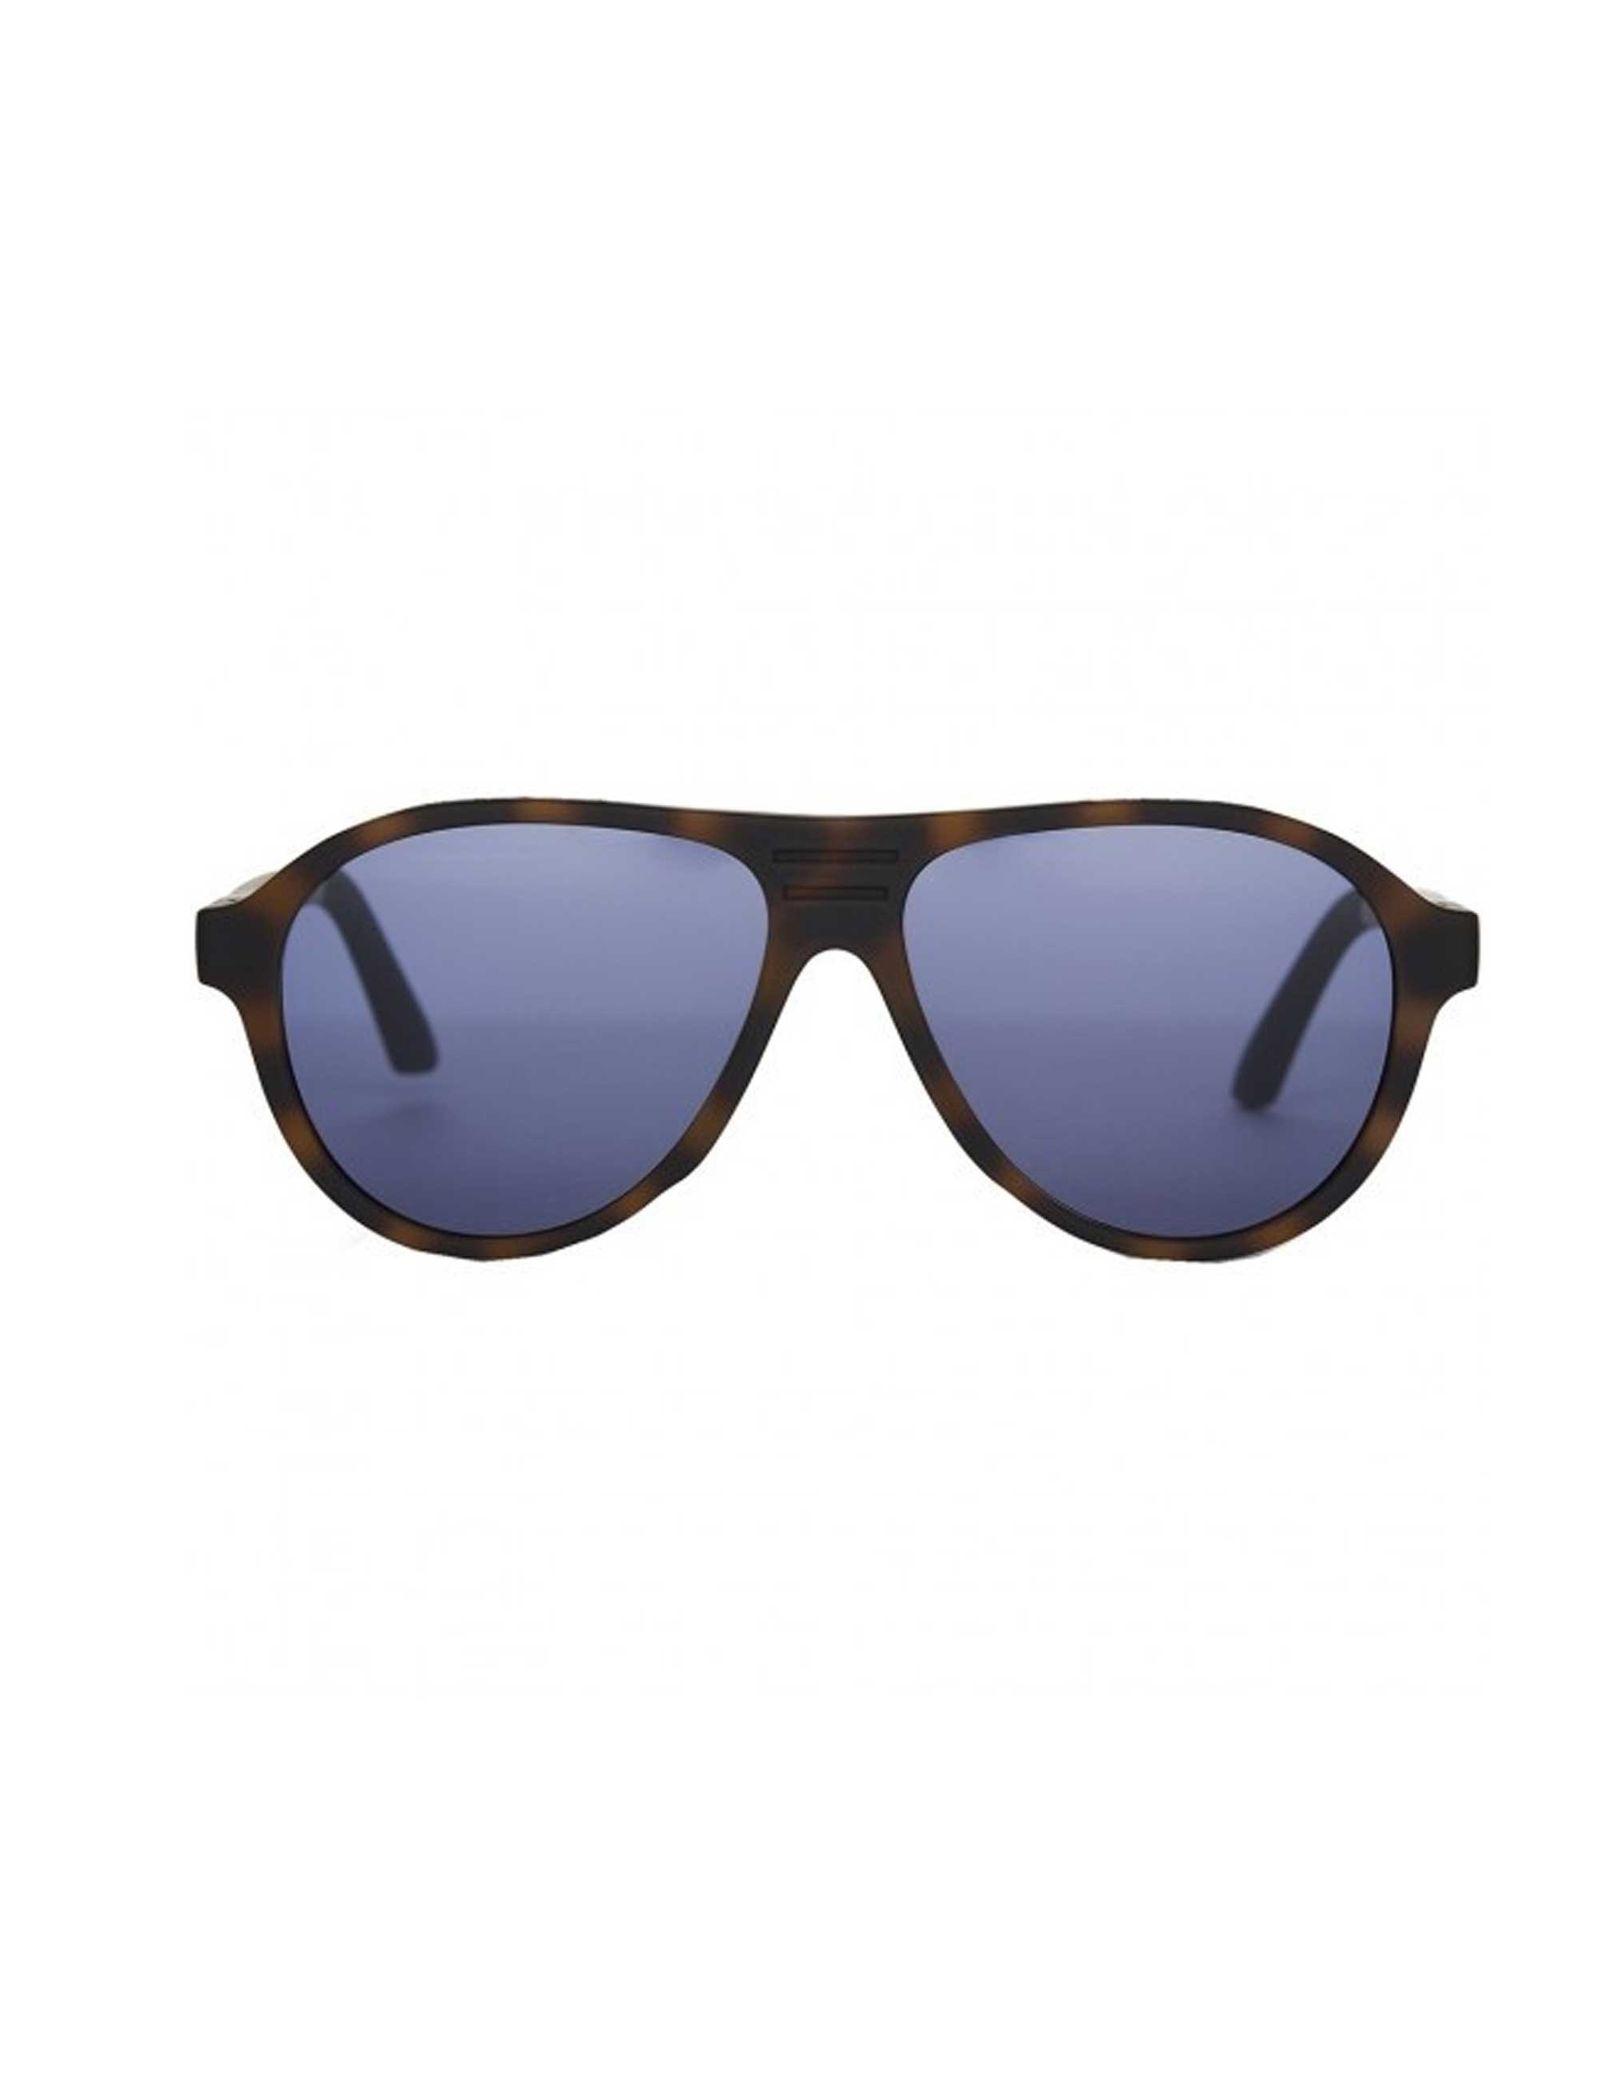 عینک آفتابی خلبانی بزرگسال ZION - تامز - قهوه اي - 2